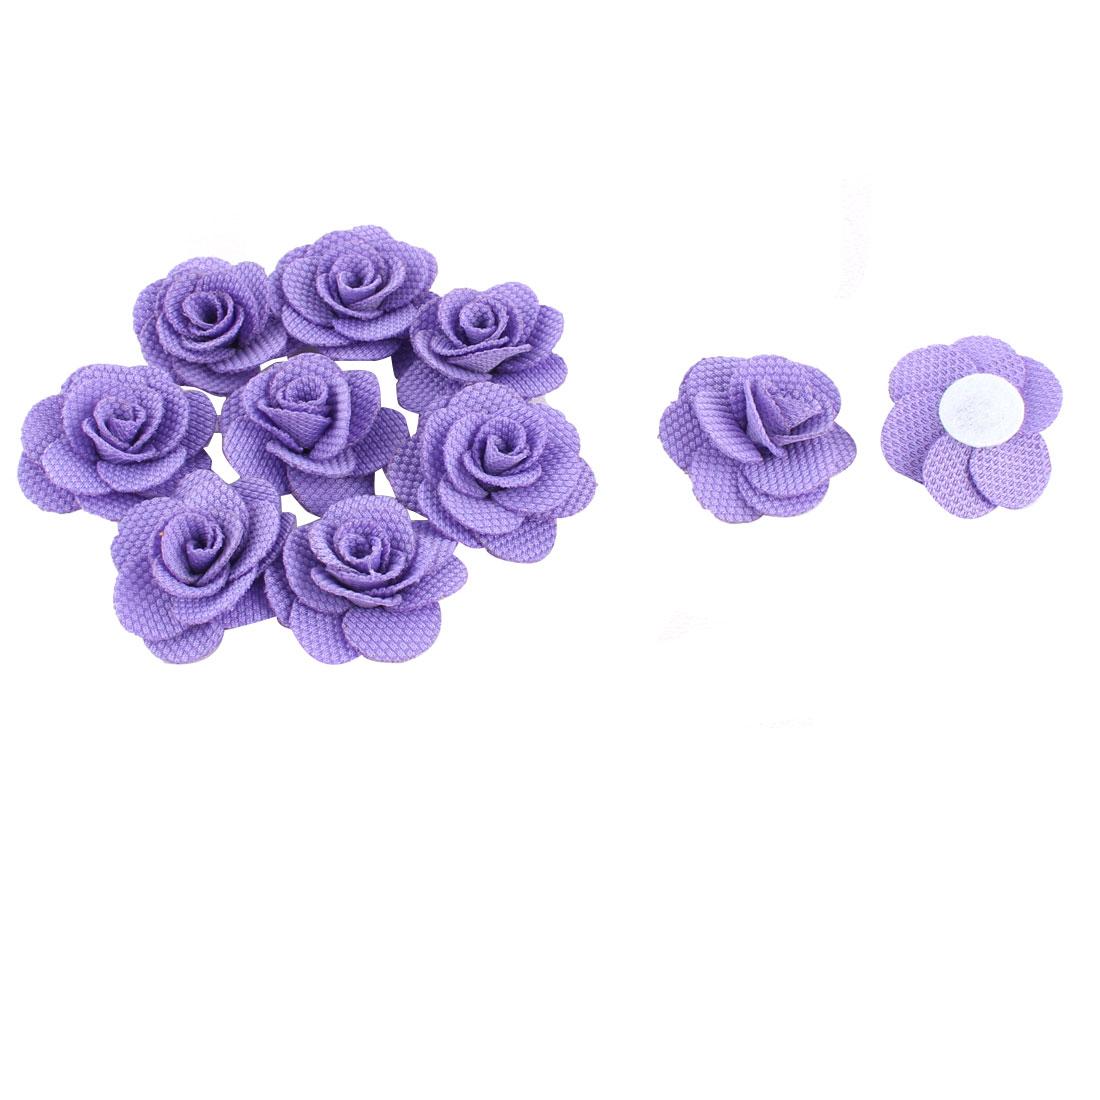 Fabric Camellia Flower Craft DIY Wedding Ornament Ribbon Flowers Purple 10pcs